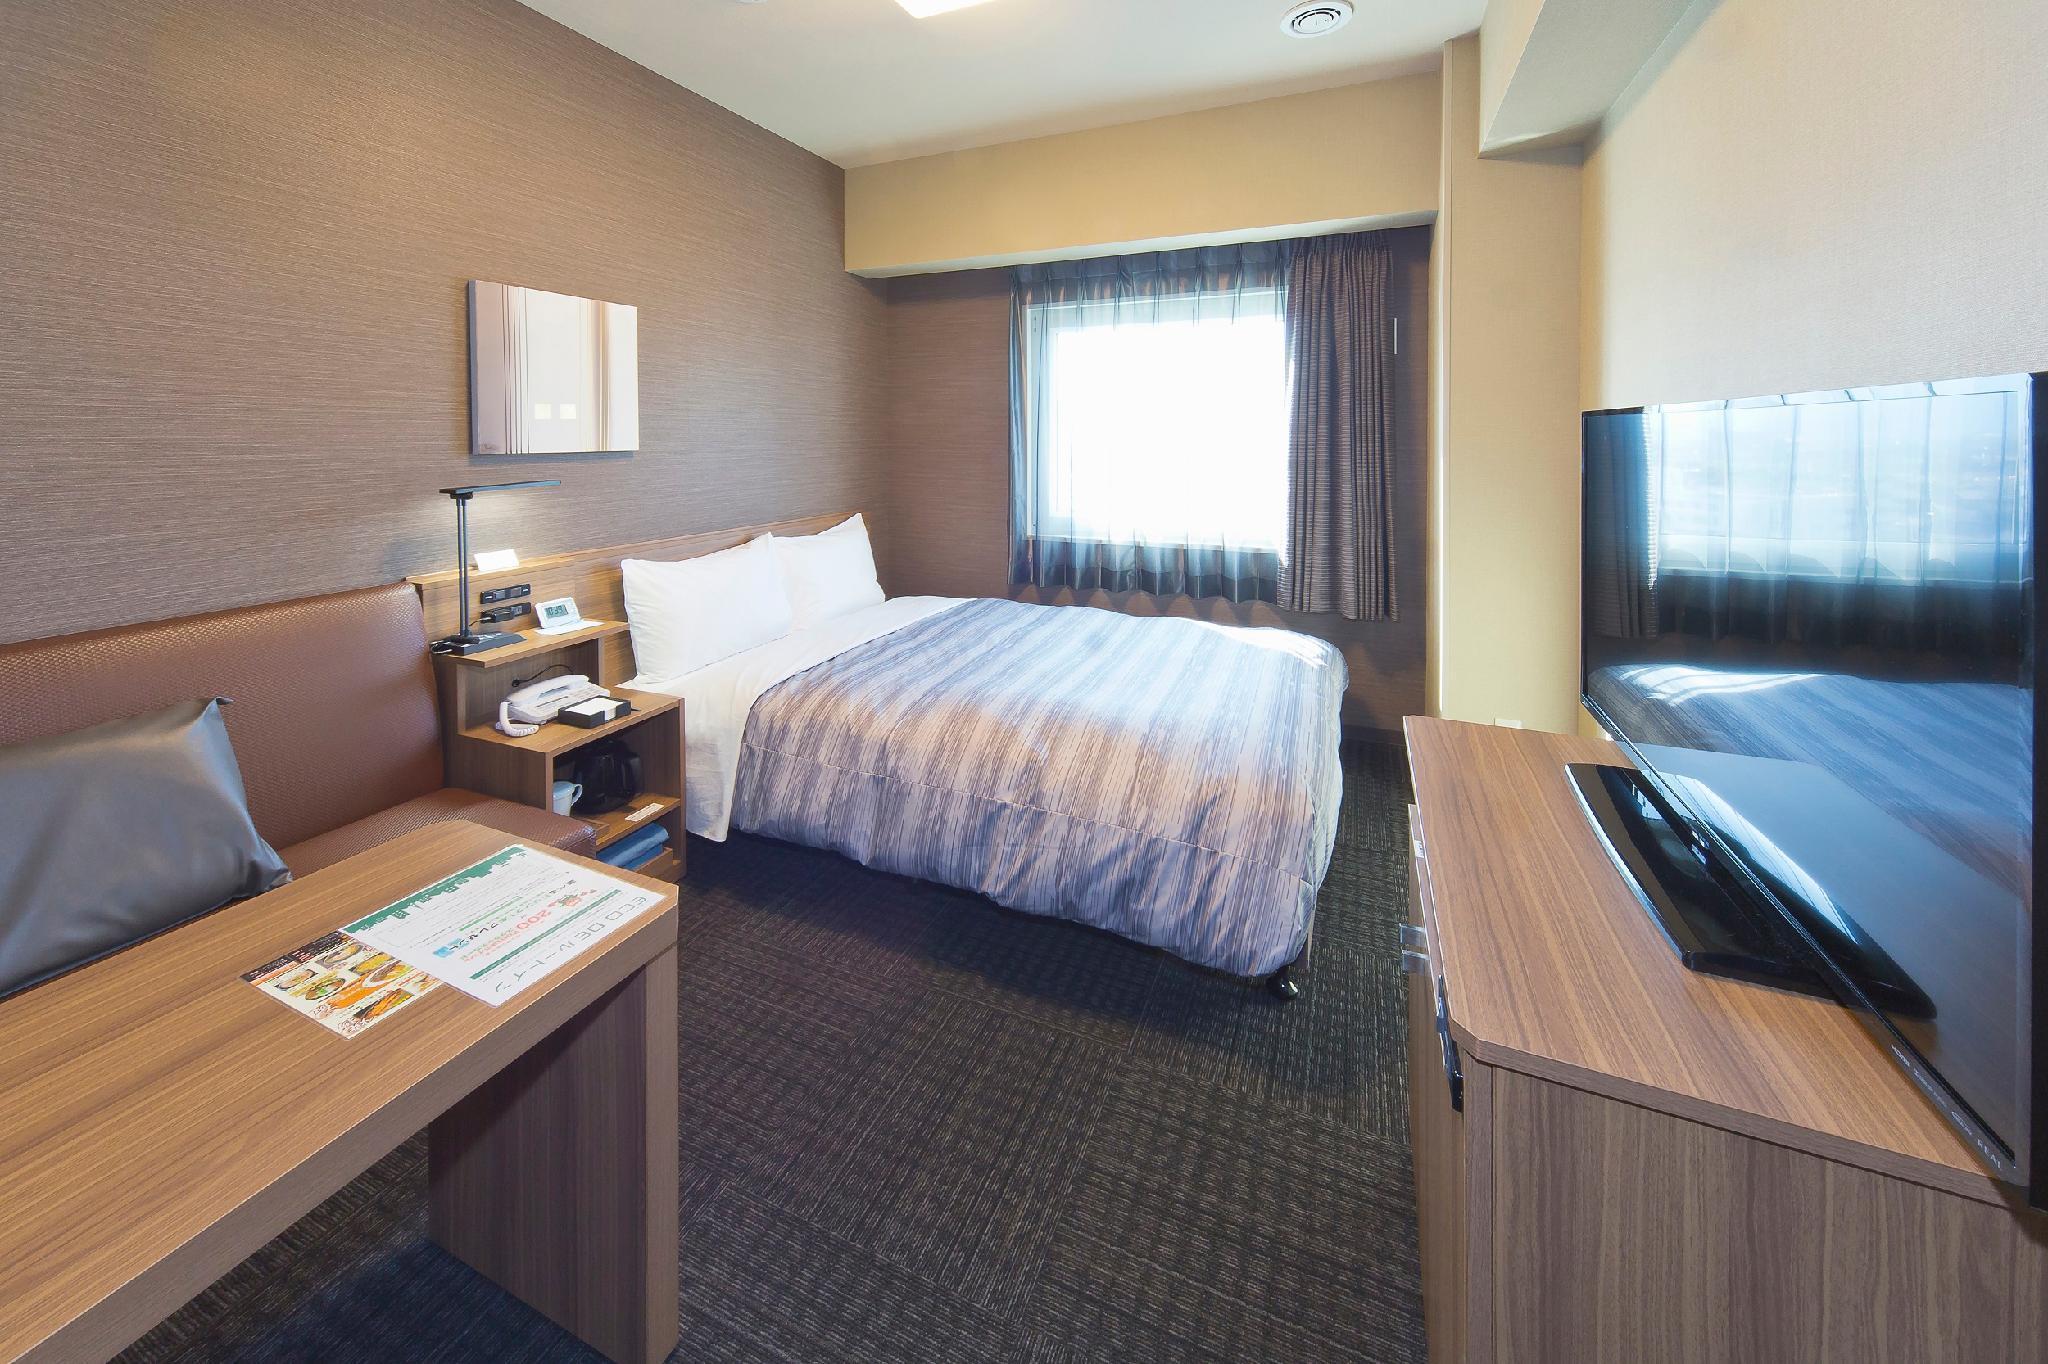 HOTEL ROUTE INN YAMAGUCHI YUDAONSEN, Yamaguchi